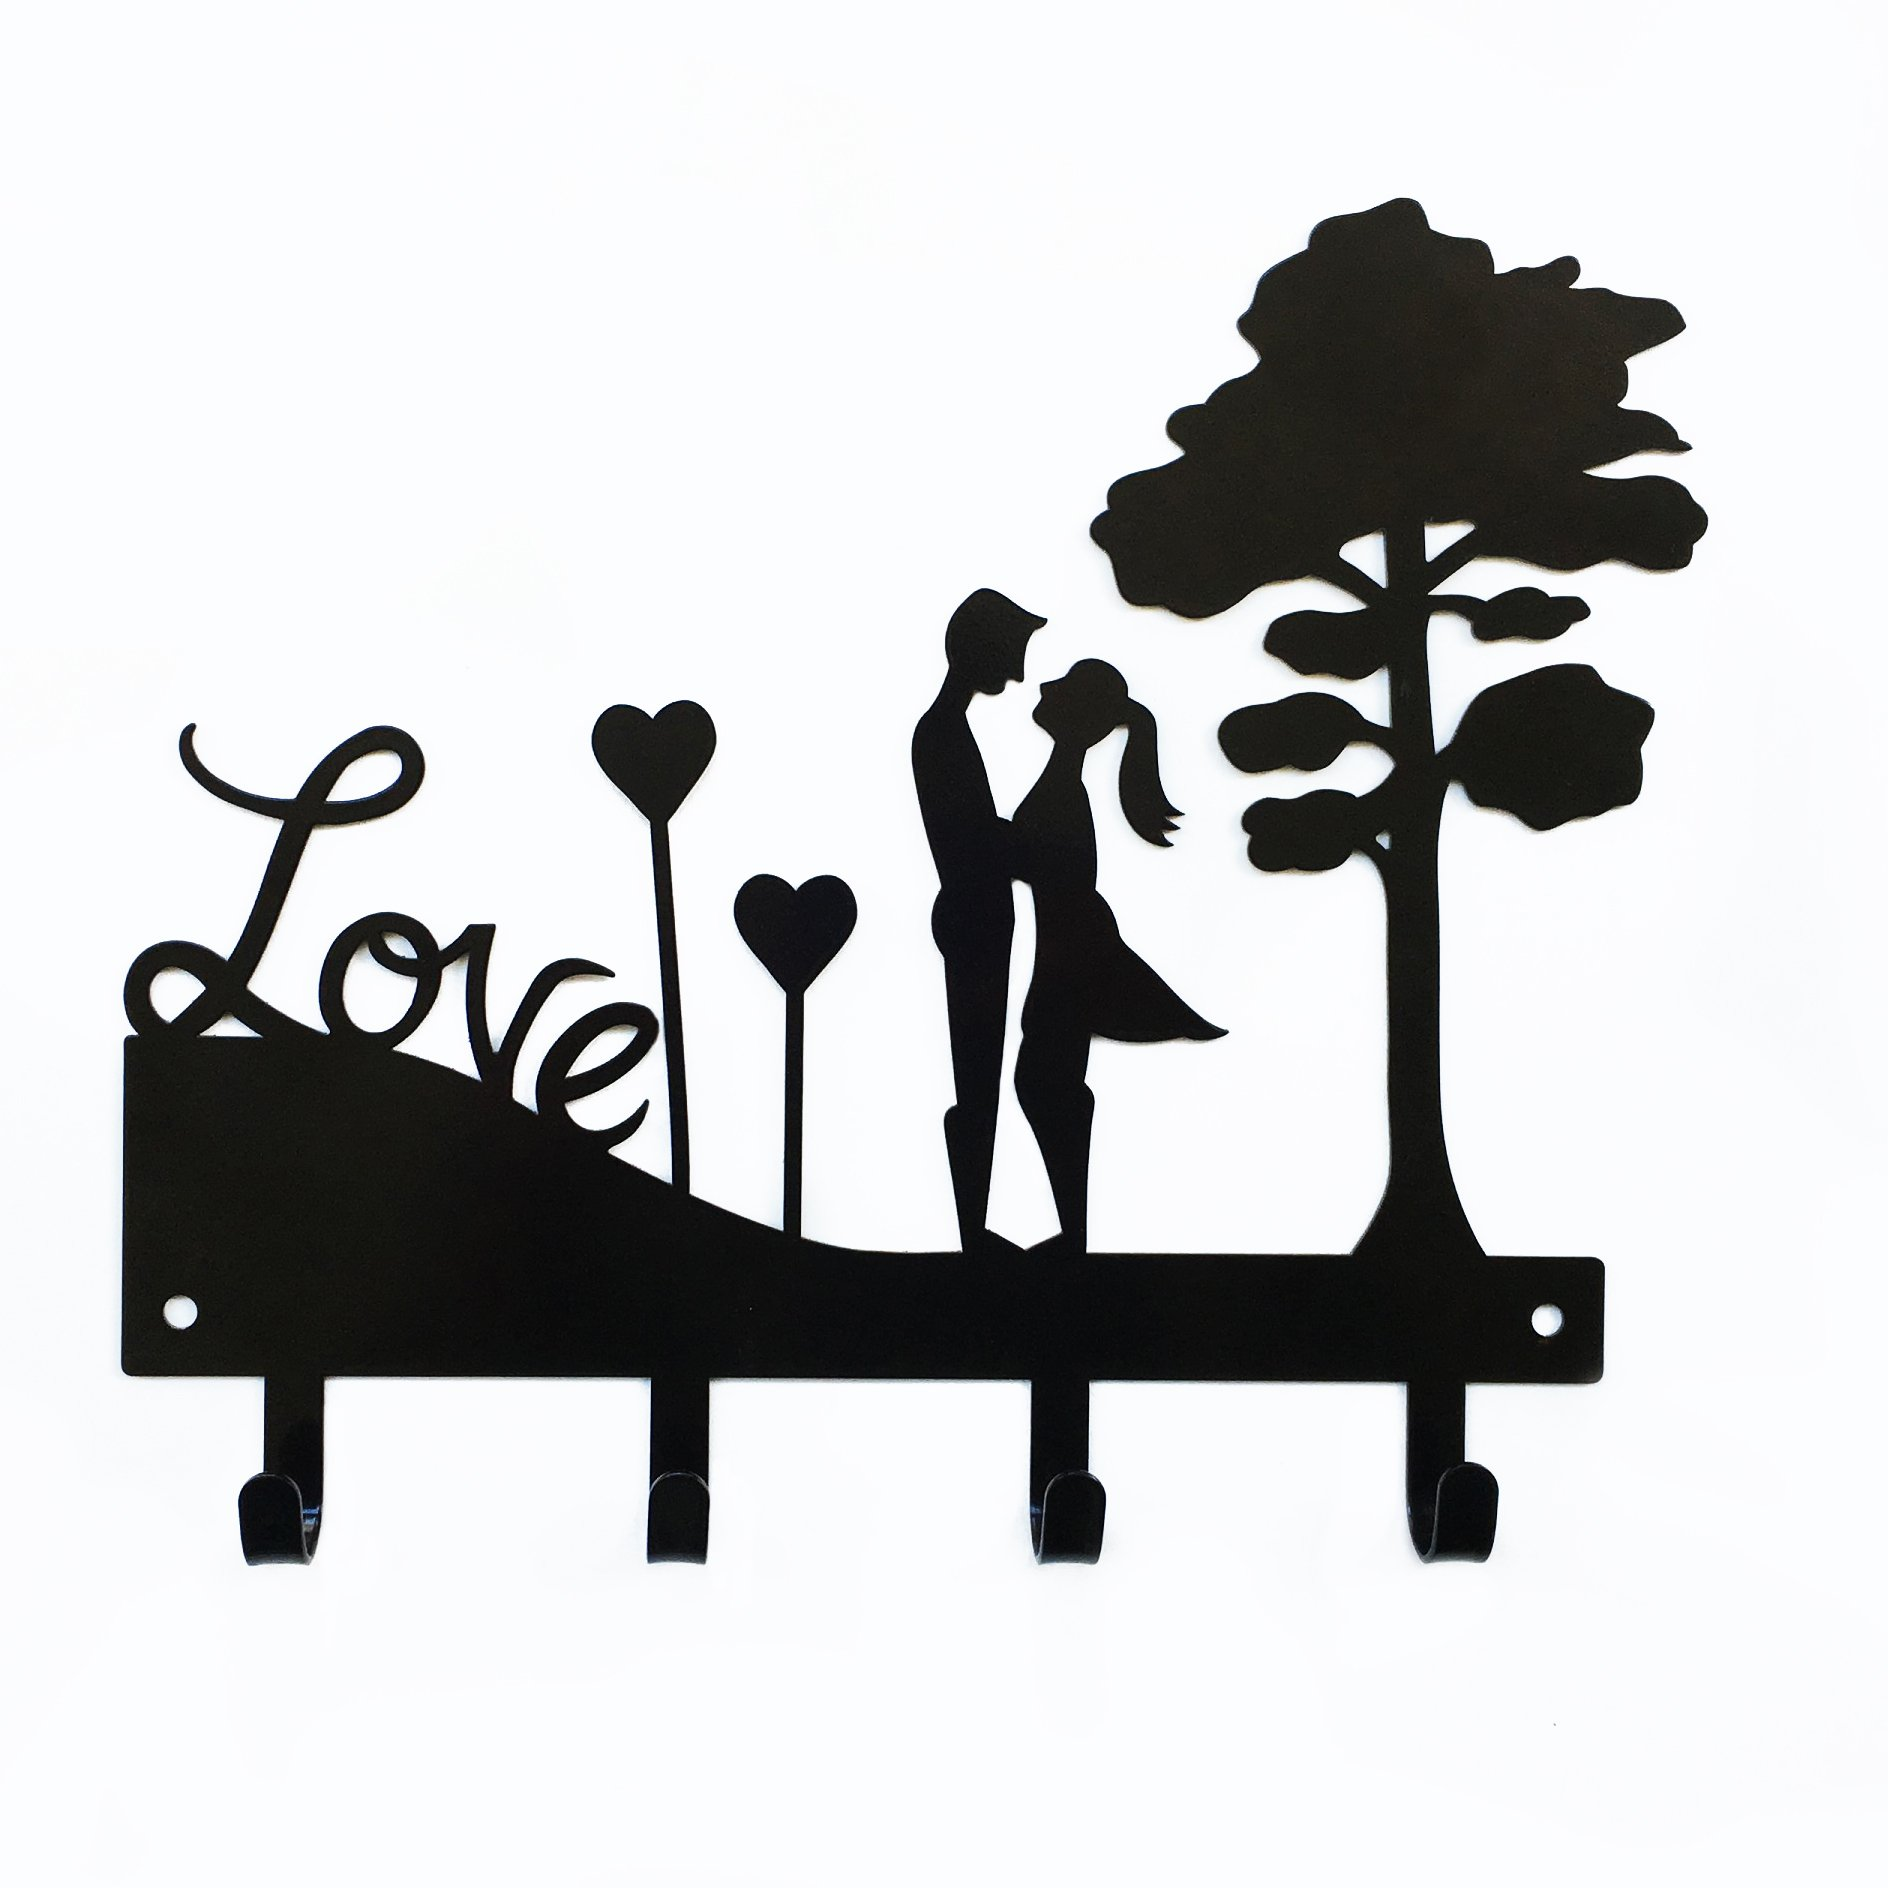 Love Couple Key Holder | Key Holder for Wall | Key Rack Organizer for Entryway and Kitchen - Wall Mount | Housewarming Gift | 4 hook key holder | Black metal key hanger